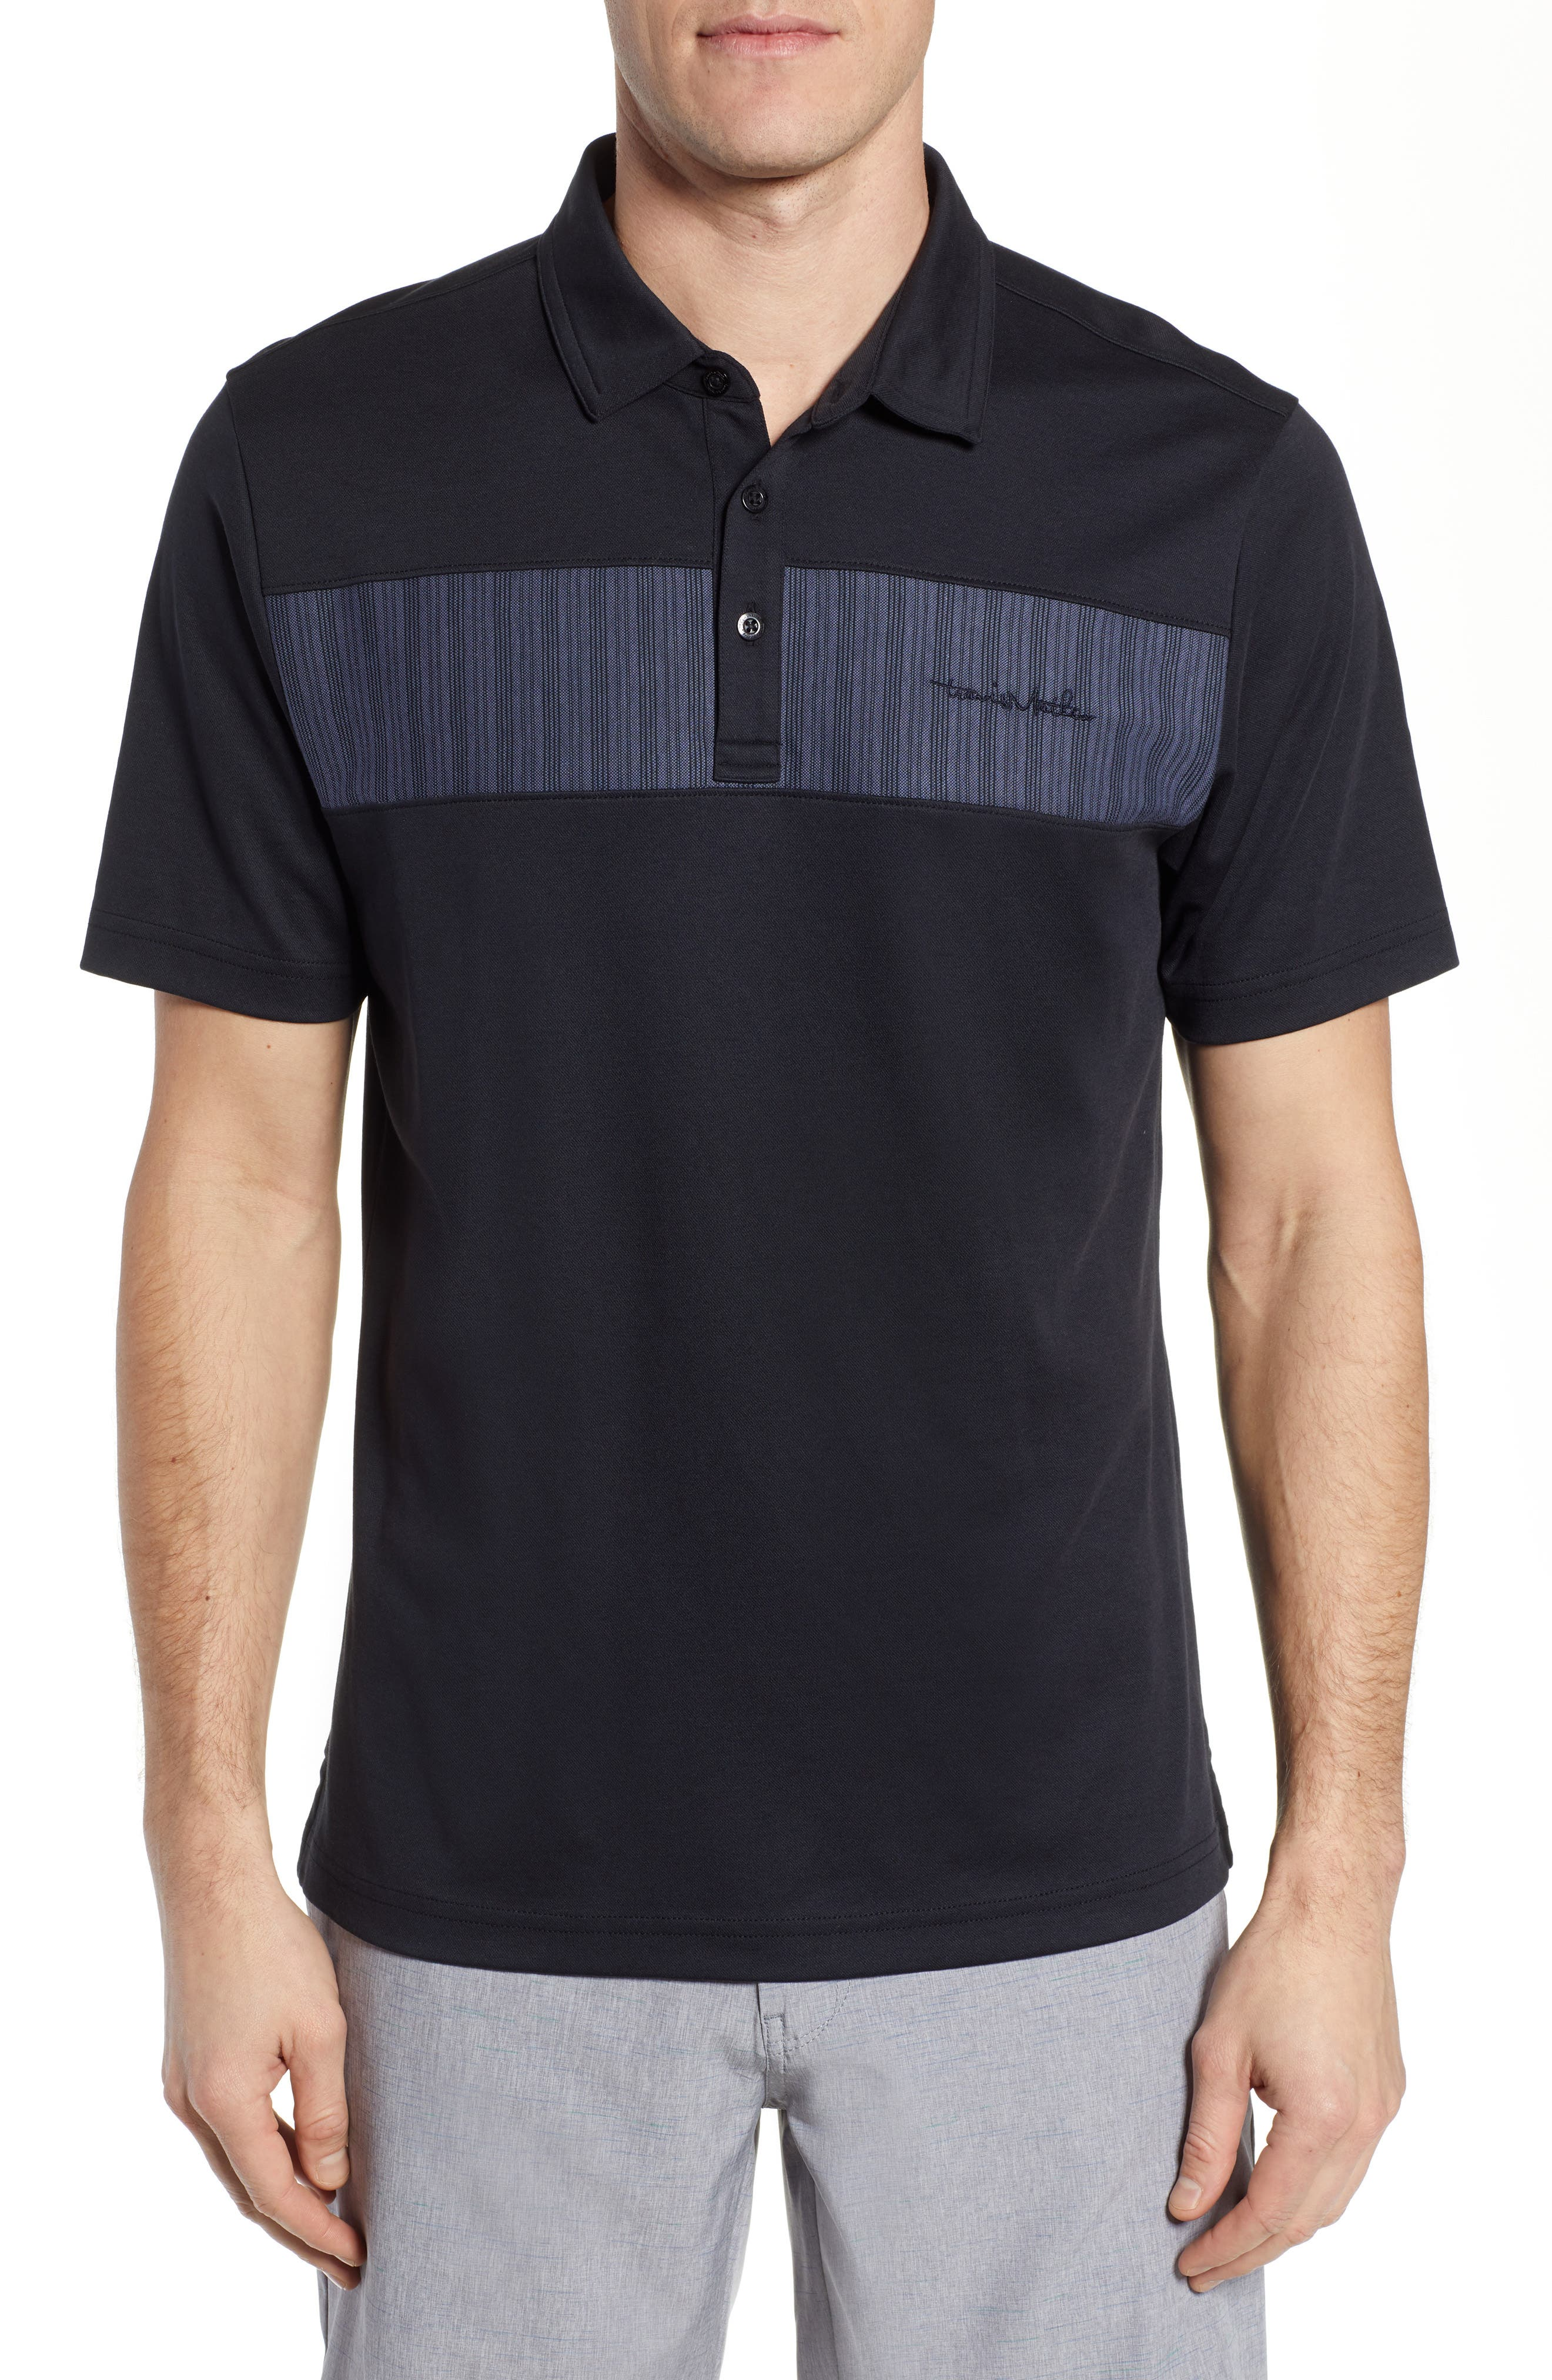 TRAVISMATHEW, Burns Regular Fit Polo, Main thumbnail 1, color, BLACK